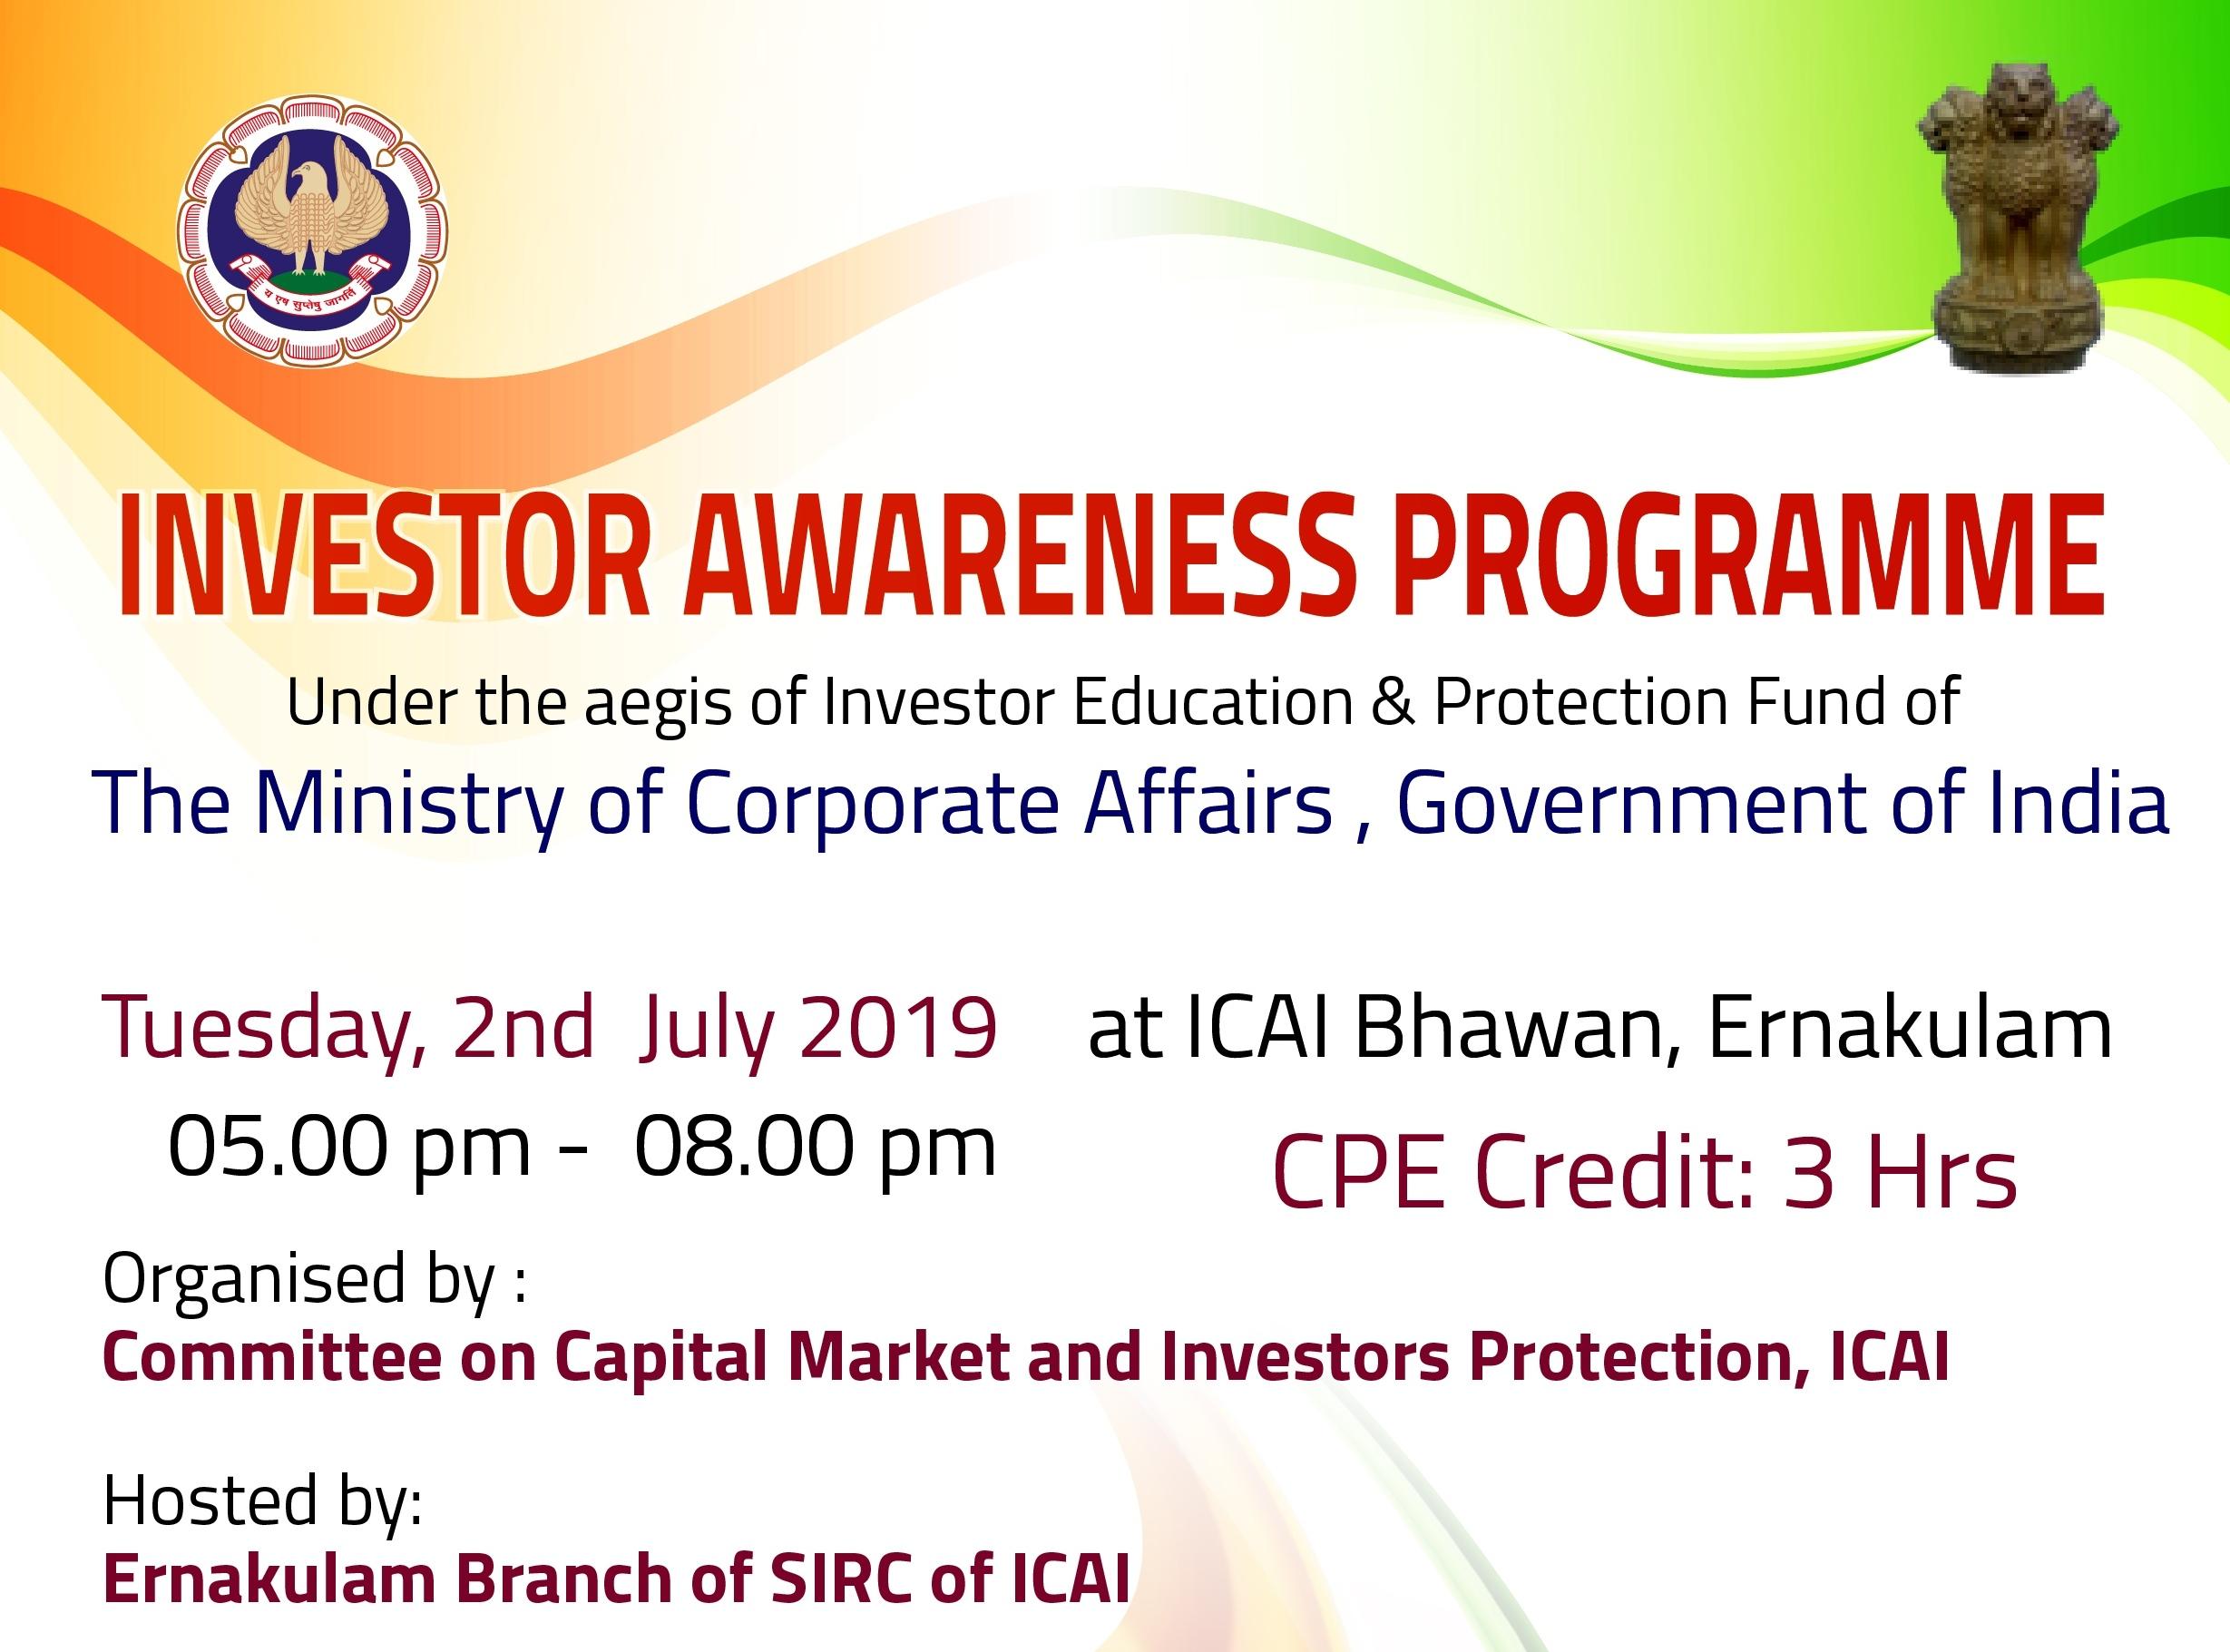 Investor Awareness Programme at ICAI Bhawan,EKM